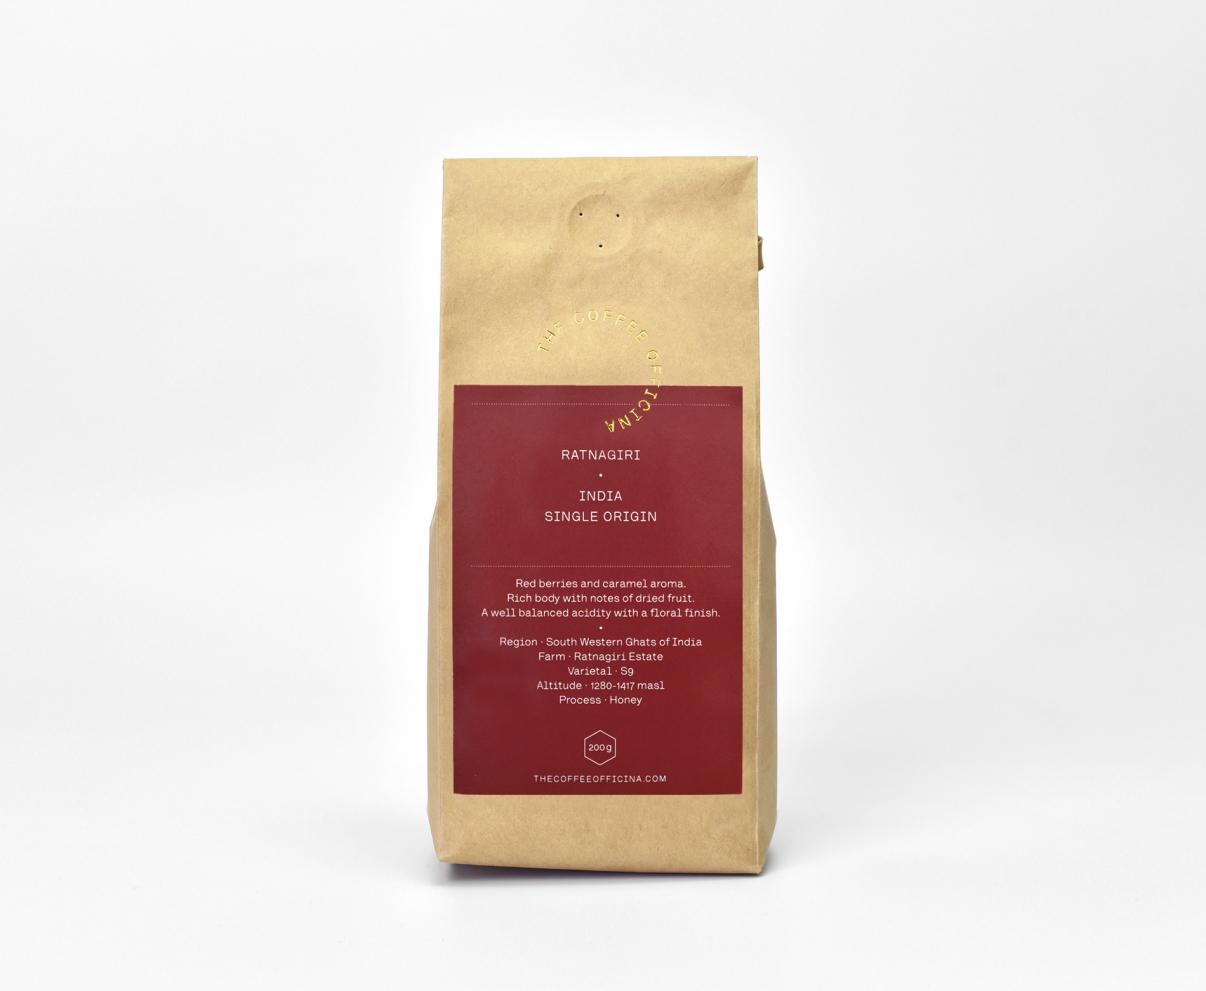 The Coffee Officina Ratnagiri India Single Origin